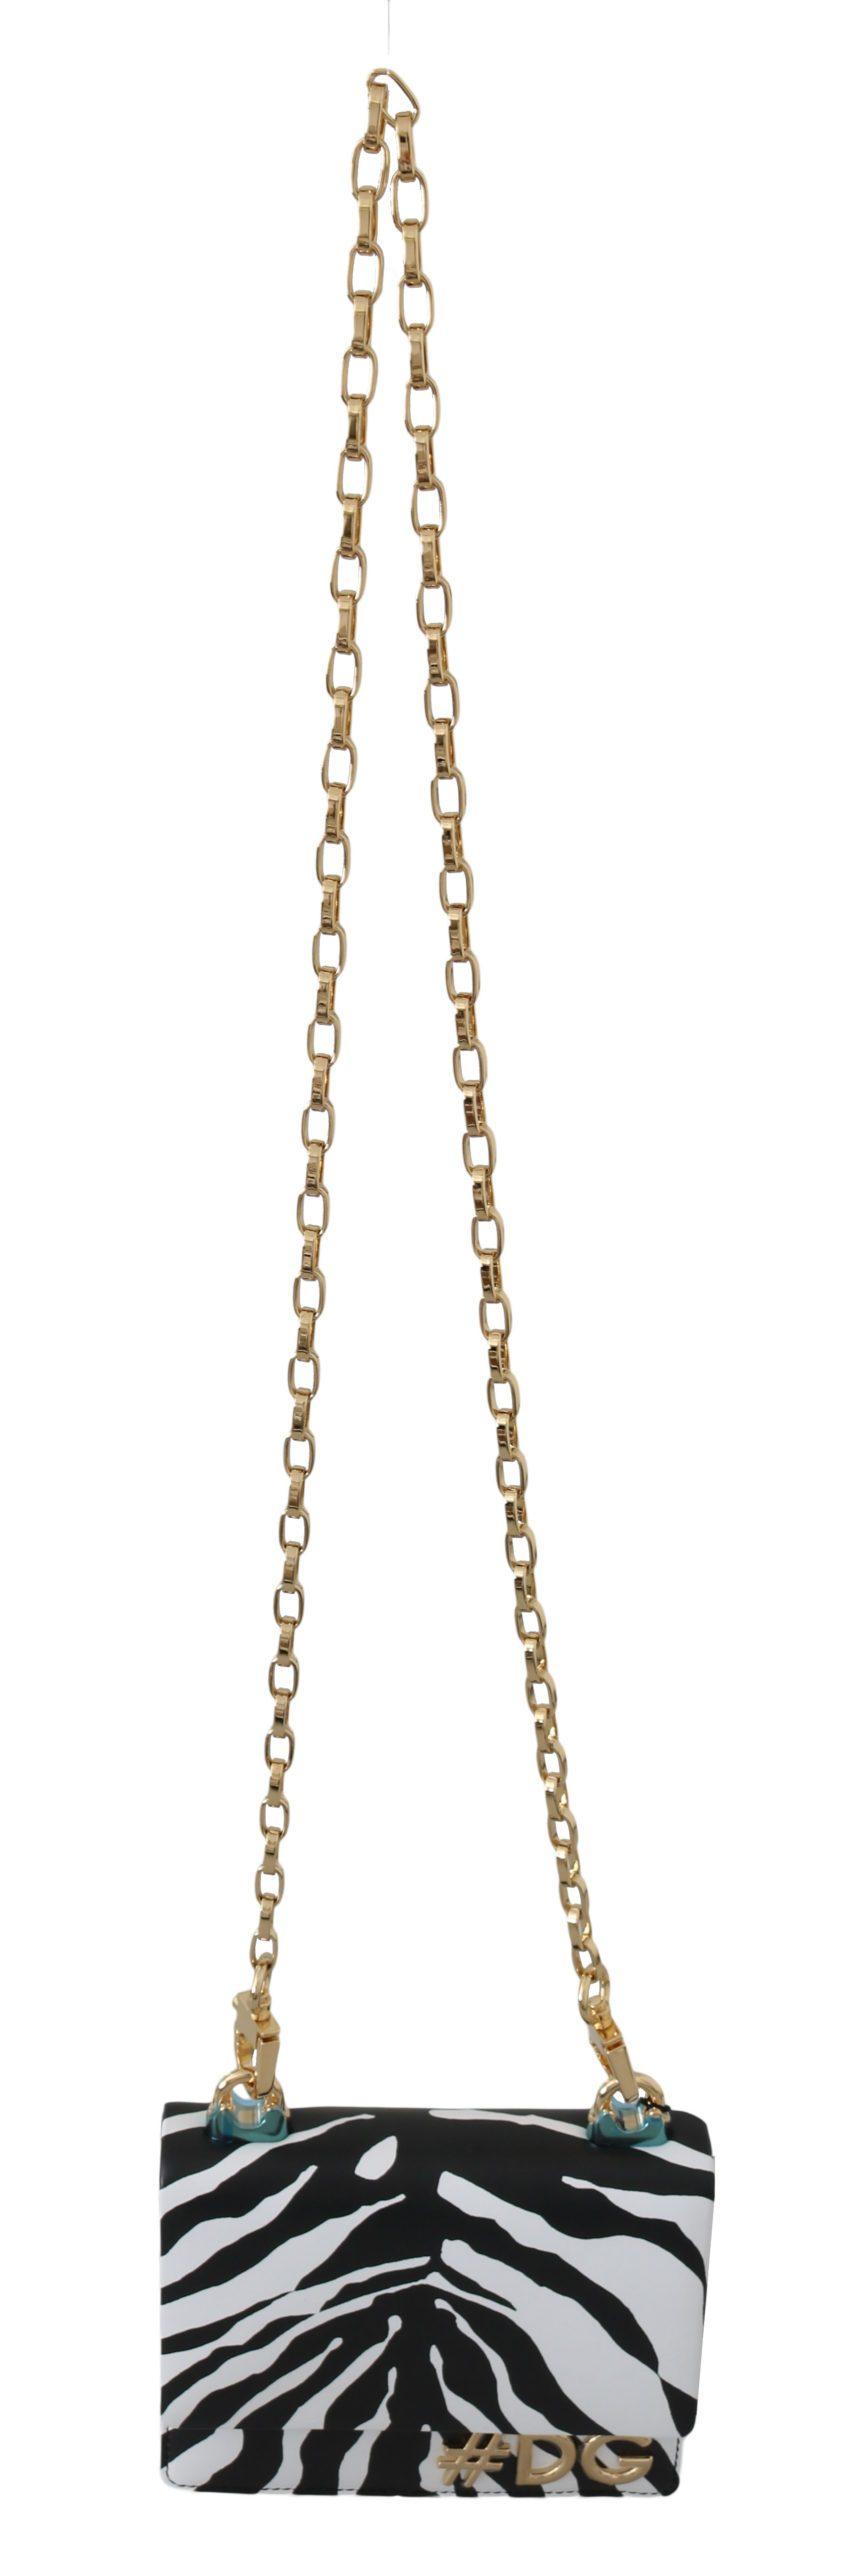 Dolce & Gabbana Women's Leather Zebra Crossbody Bag Black/White VA8622